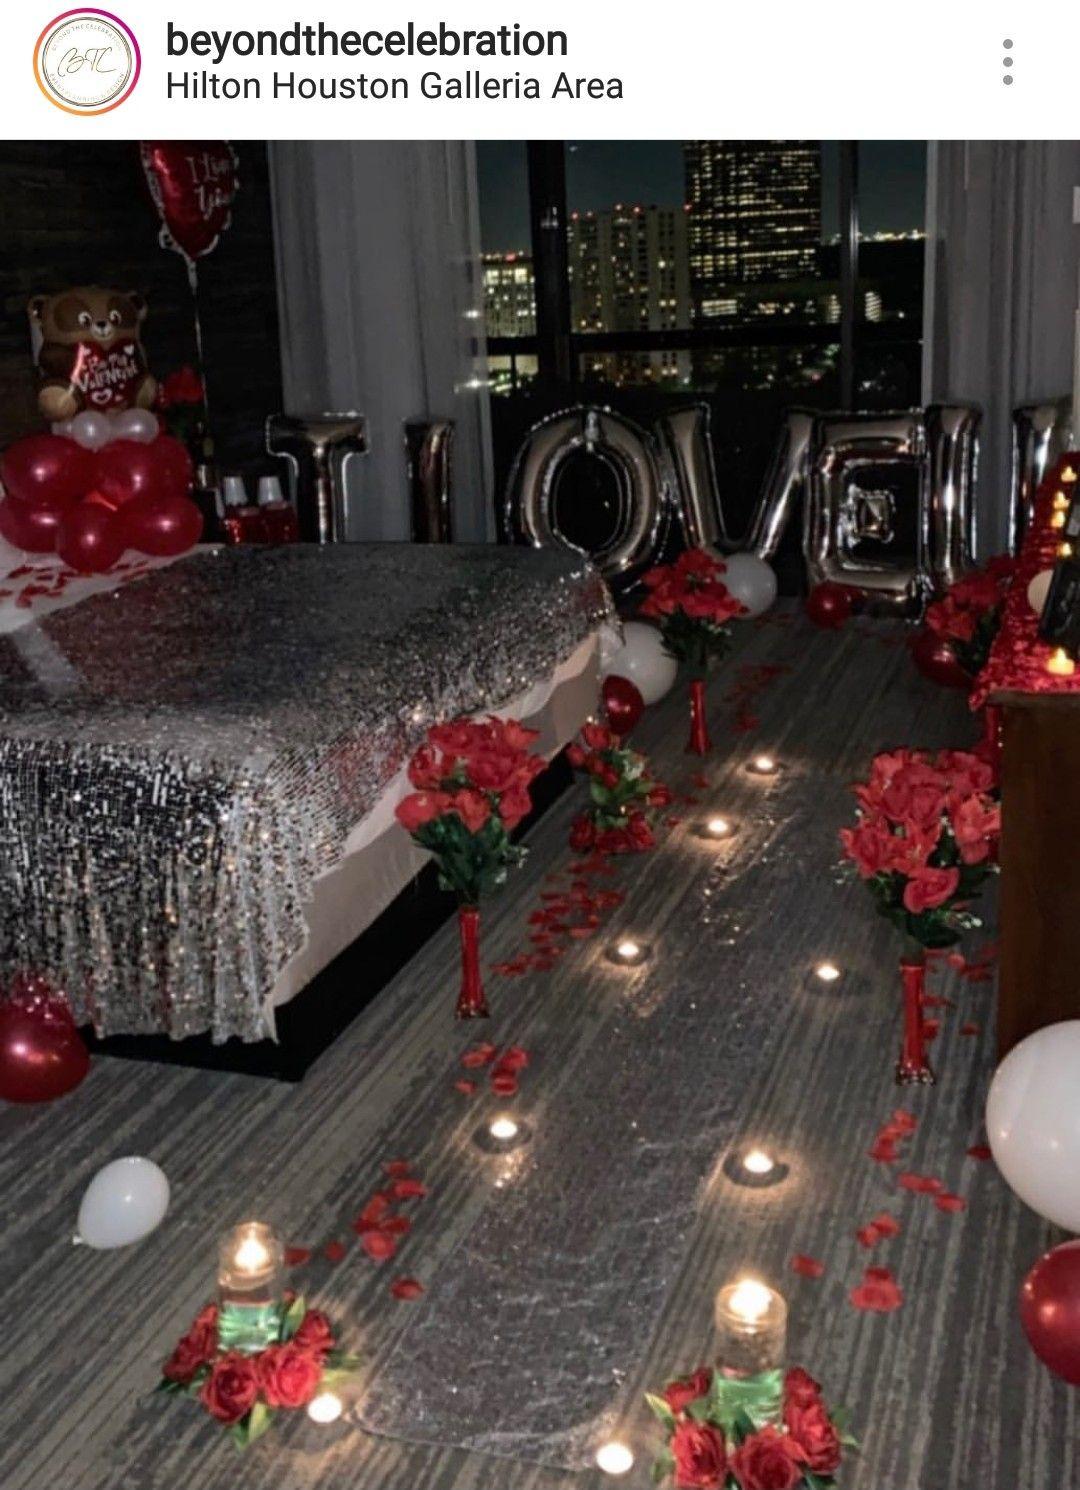 Romantic Hotel Room Ideas: Valentine's Day Hotel Room Set-up